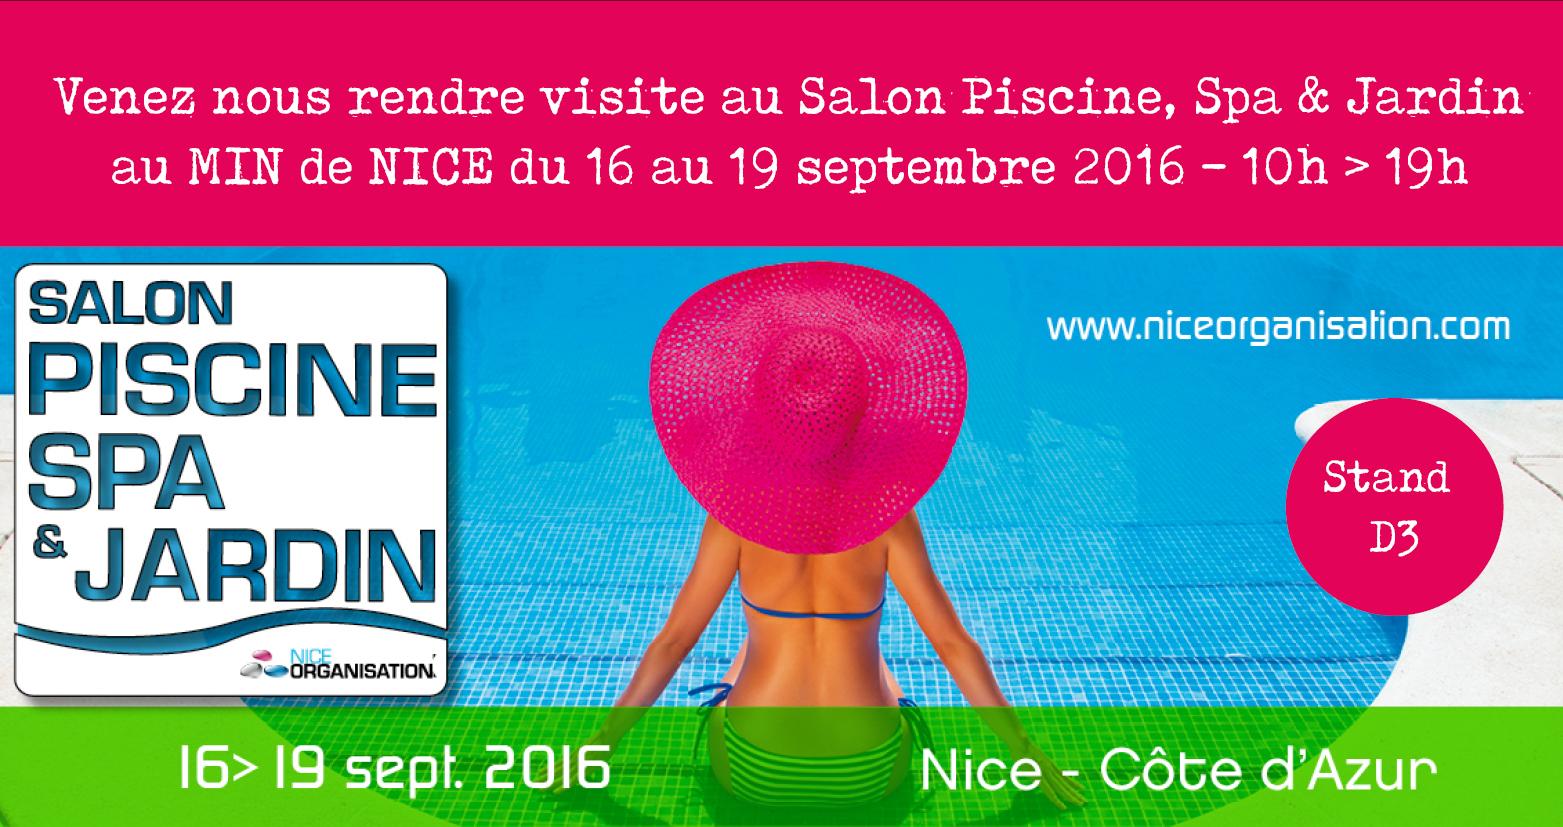 Salon piscine spa et jardin 2016 adonis paysages for Salon du jardinage 2016